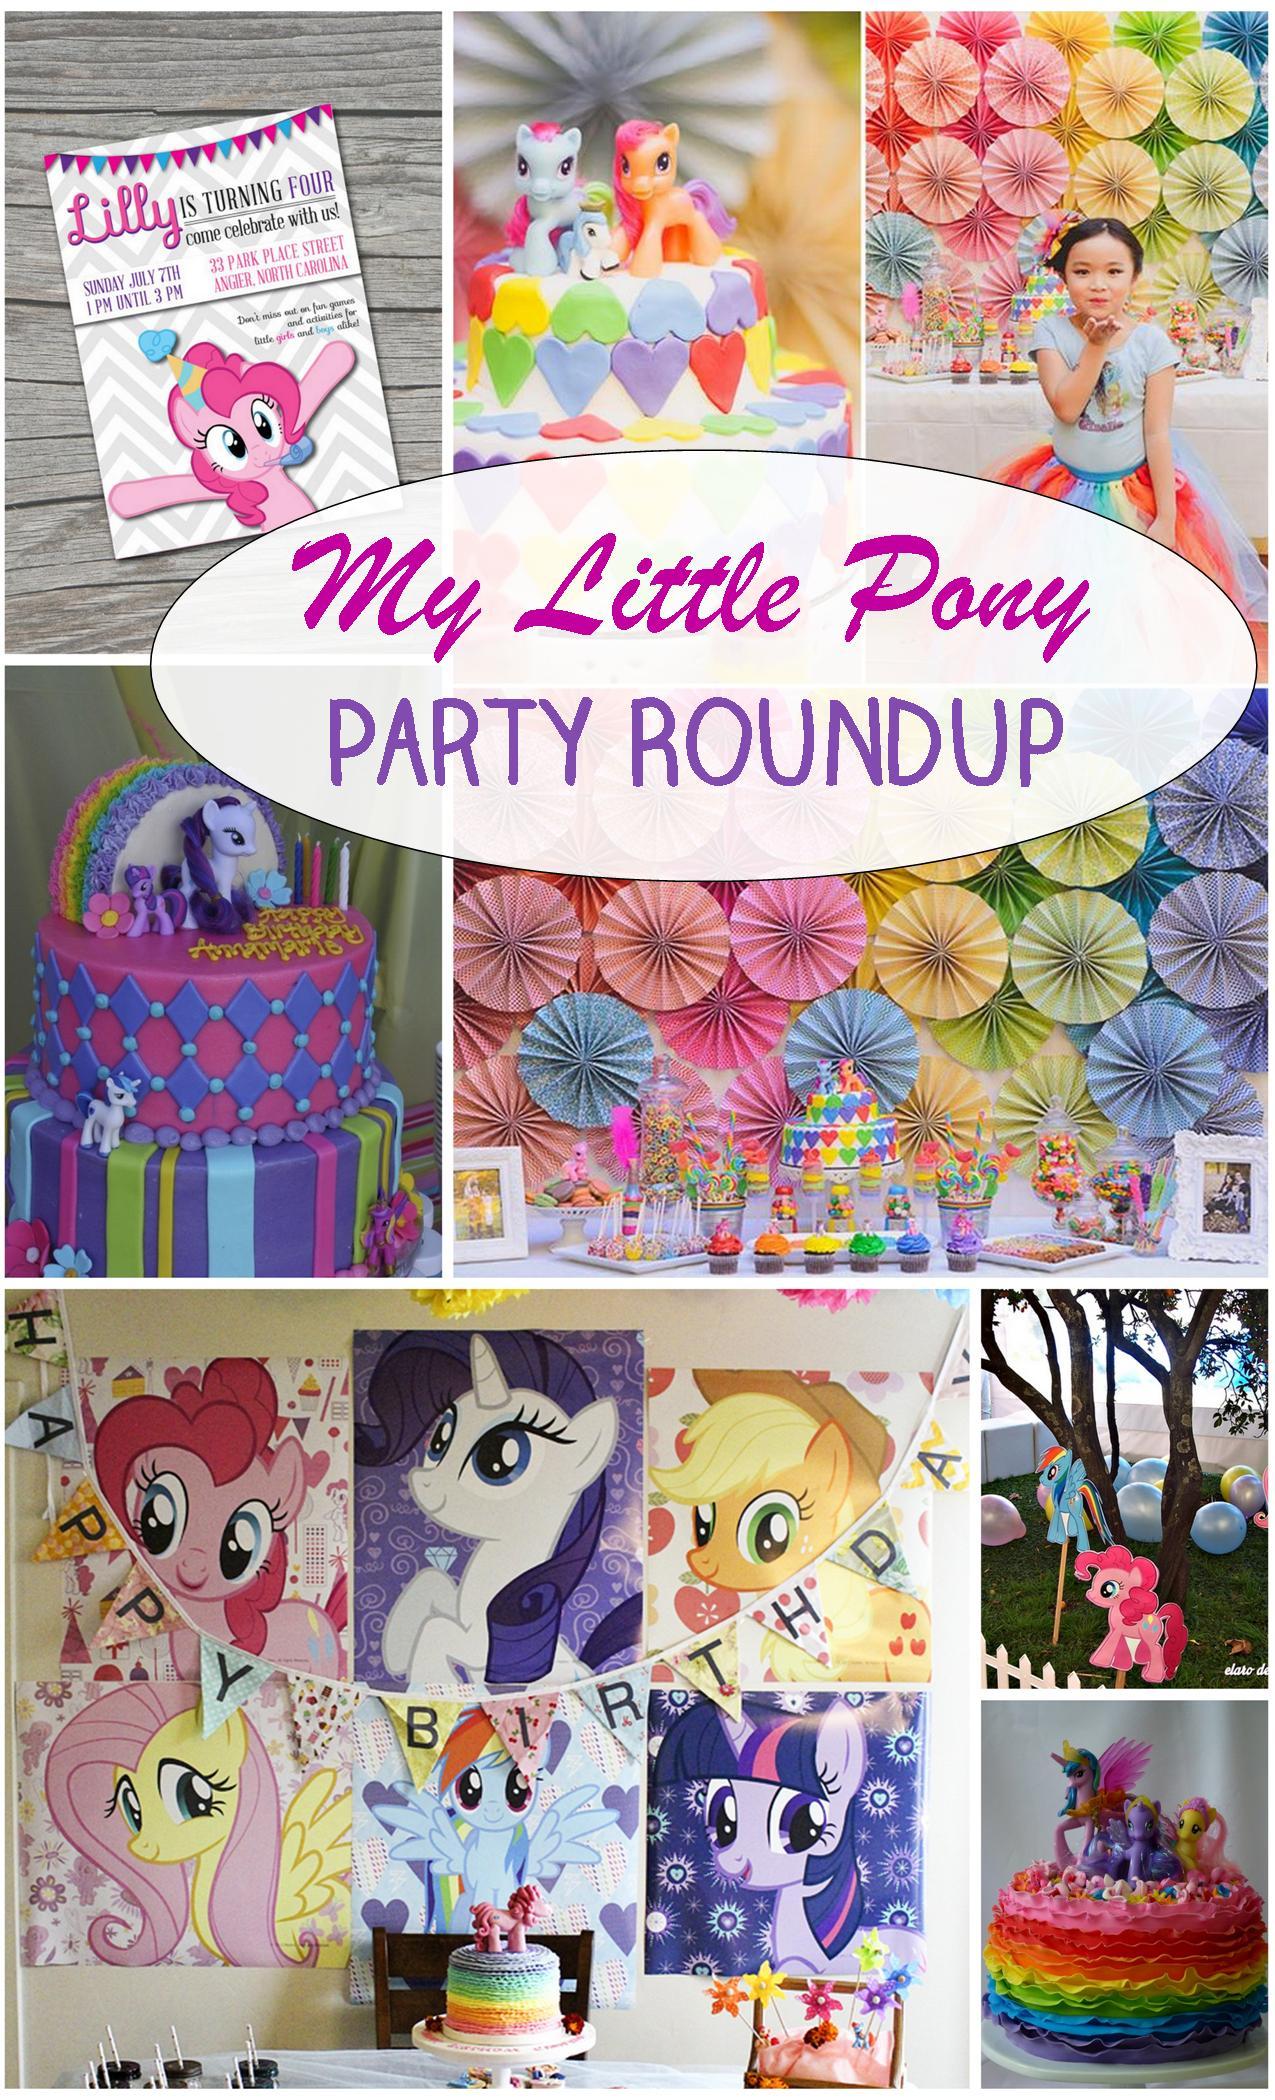 My Little Pony Party Inspiration